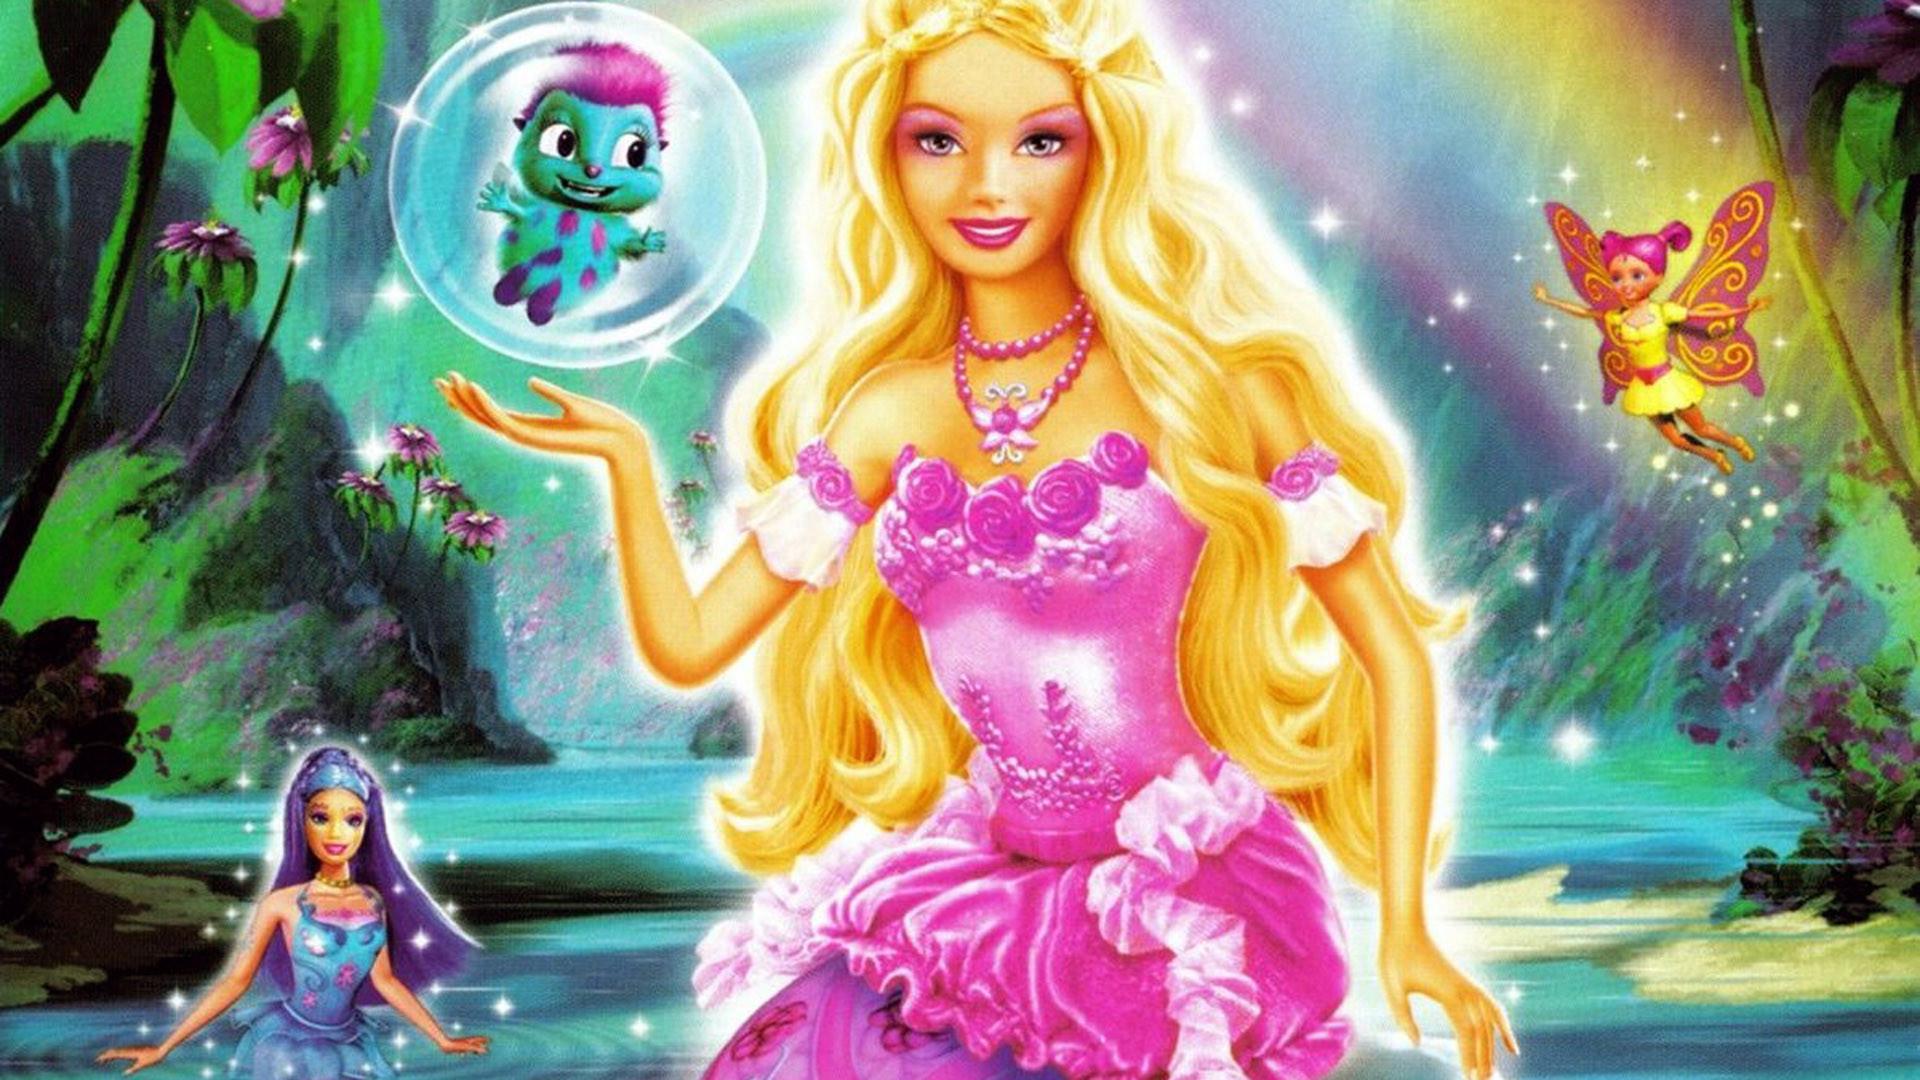 Barbie Mermaidia Wallpaper Wwwpixsharkcom Images Galleries With A Bite